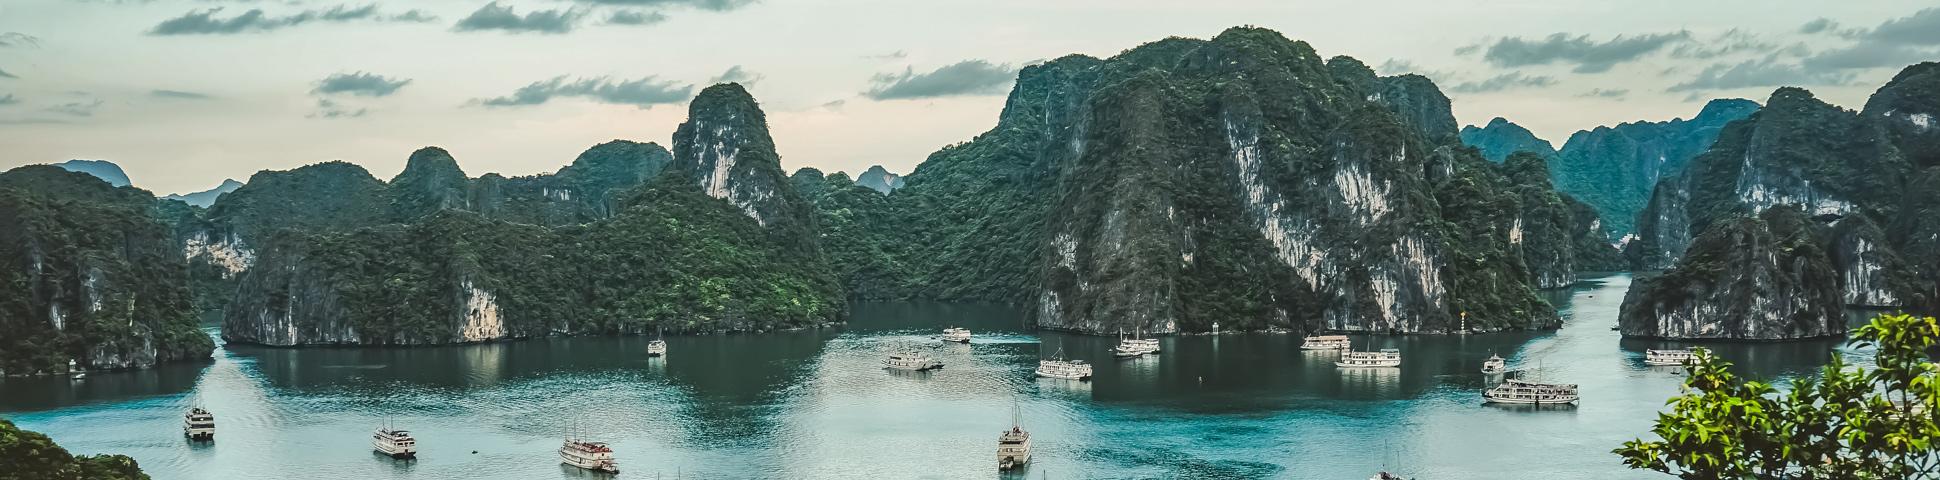 Panoramic view from Northern Vietnam Trekking and Halong Bay